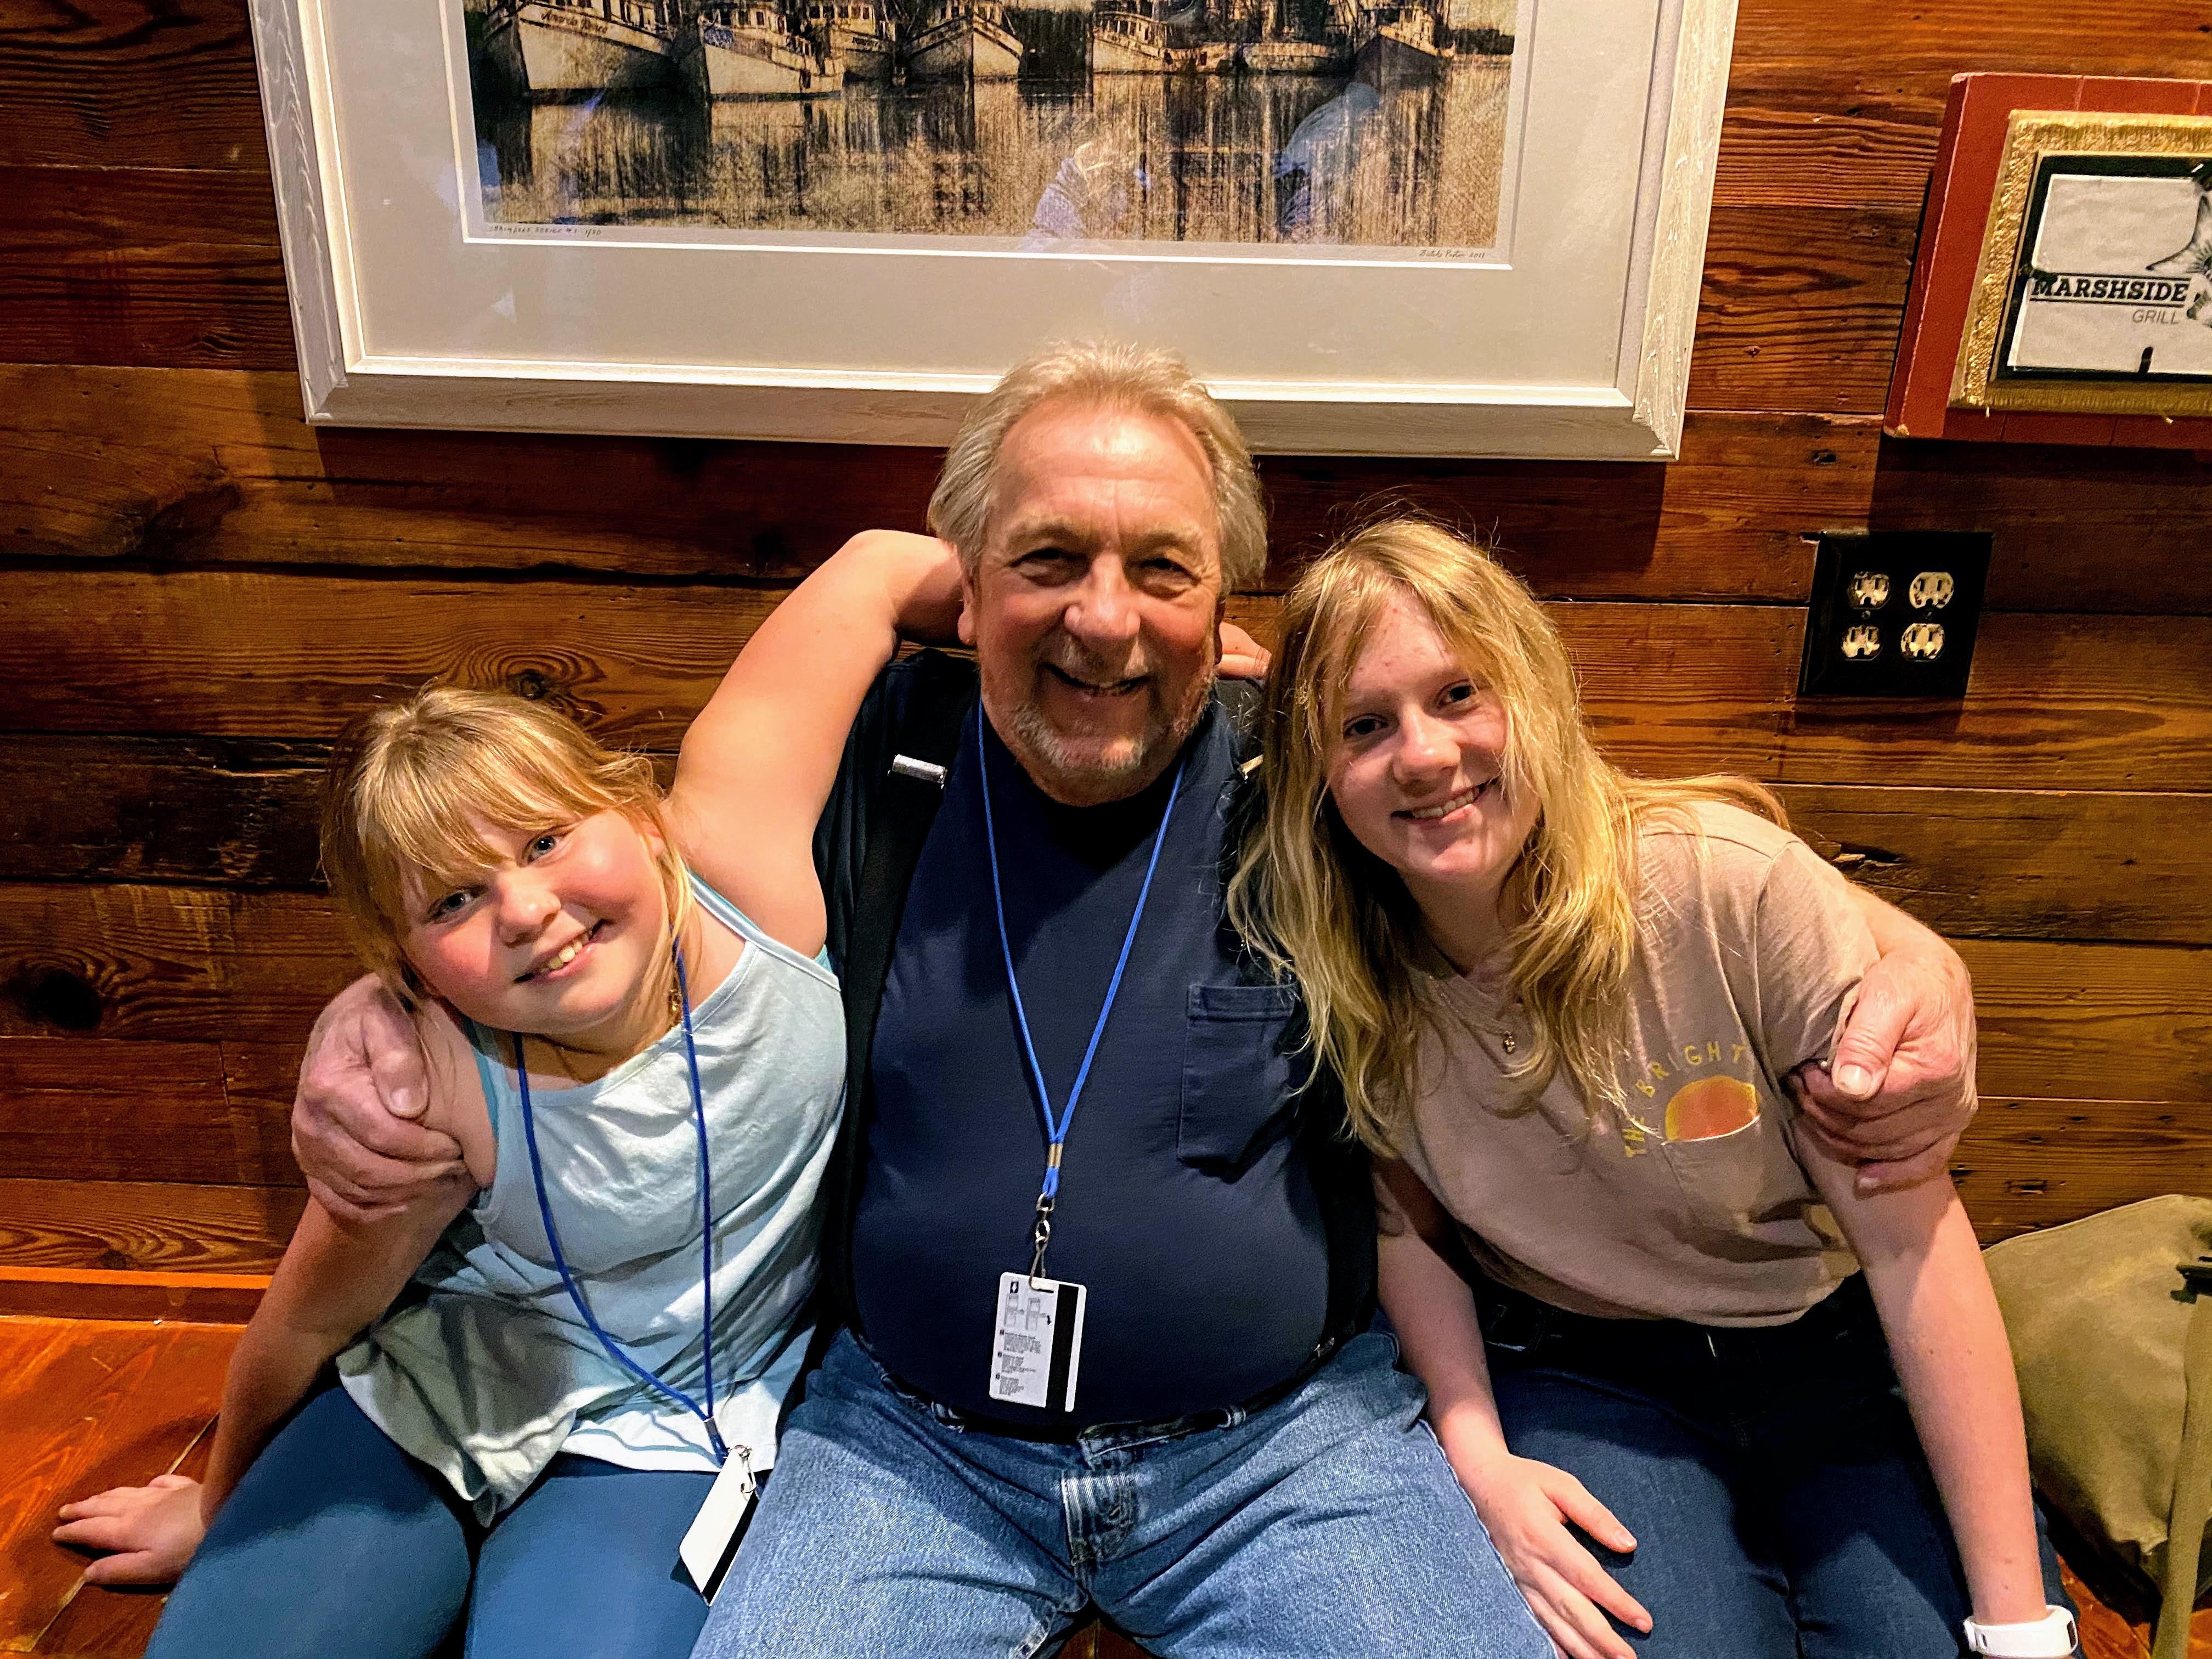 Grampsy with Girls sitting